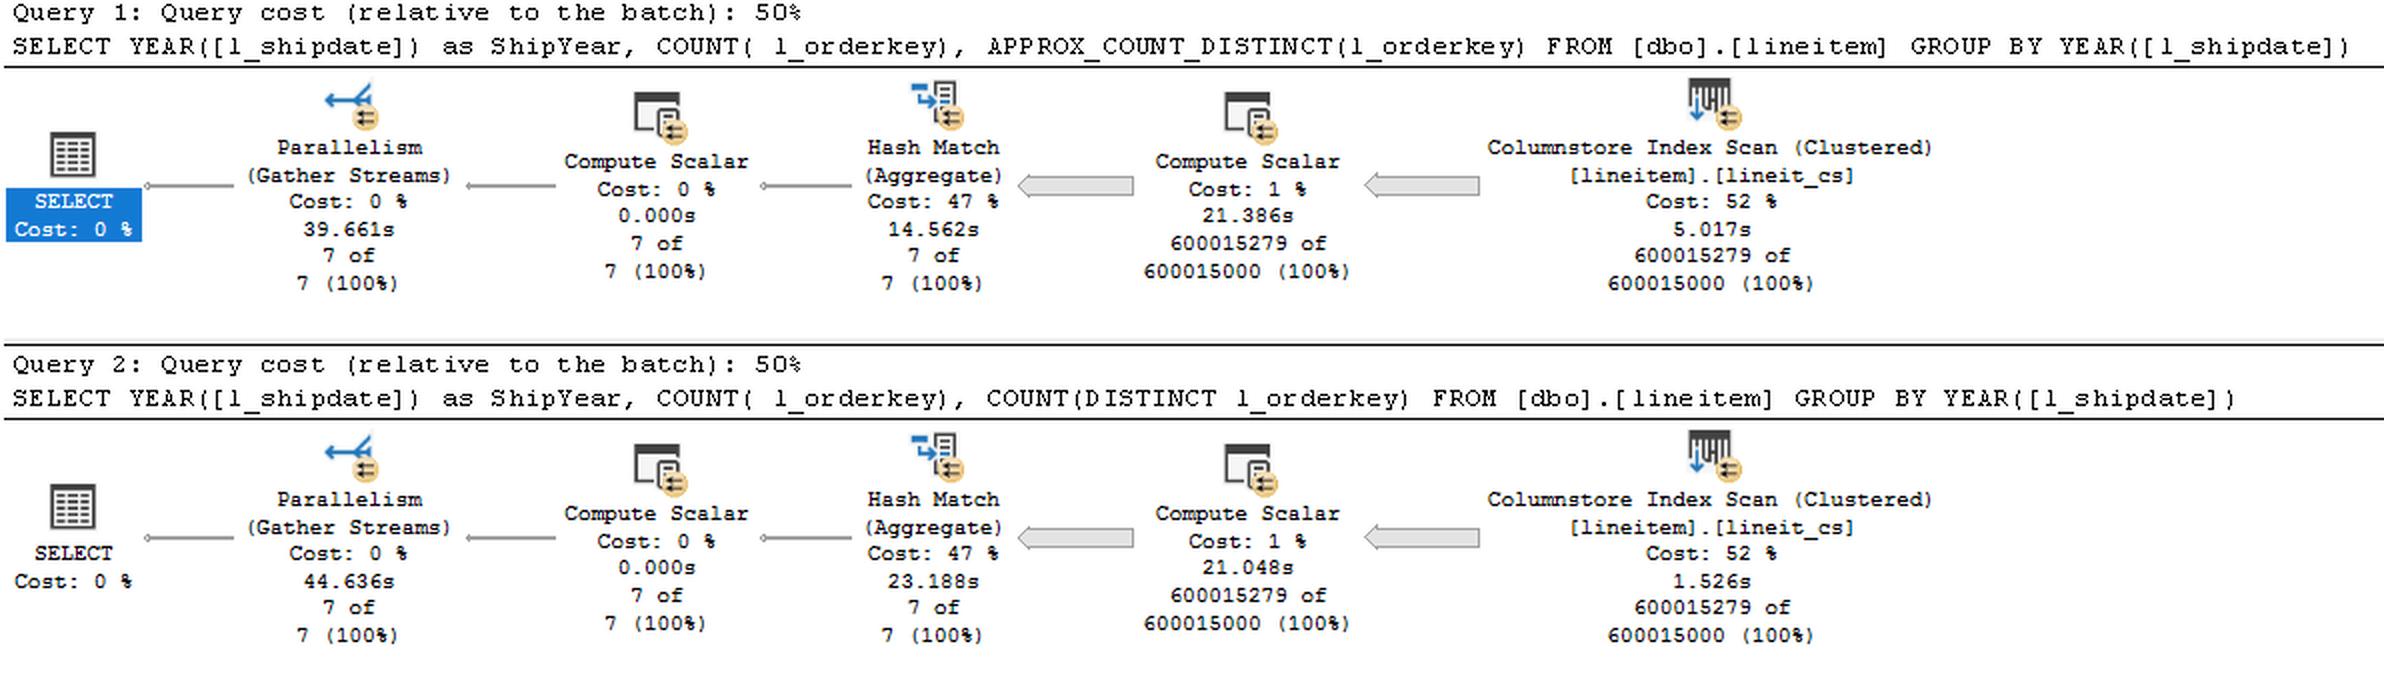 Count Distinct 2 Columns Sql Server SQL SELECT with DISTINCT